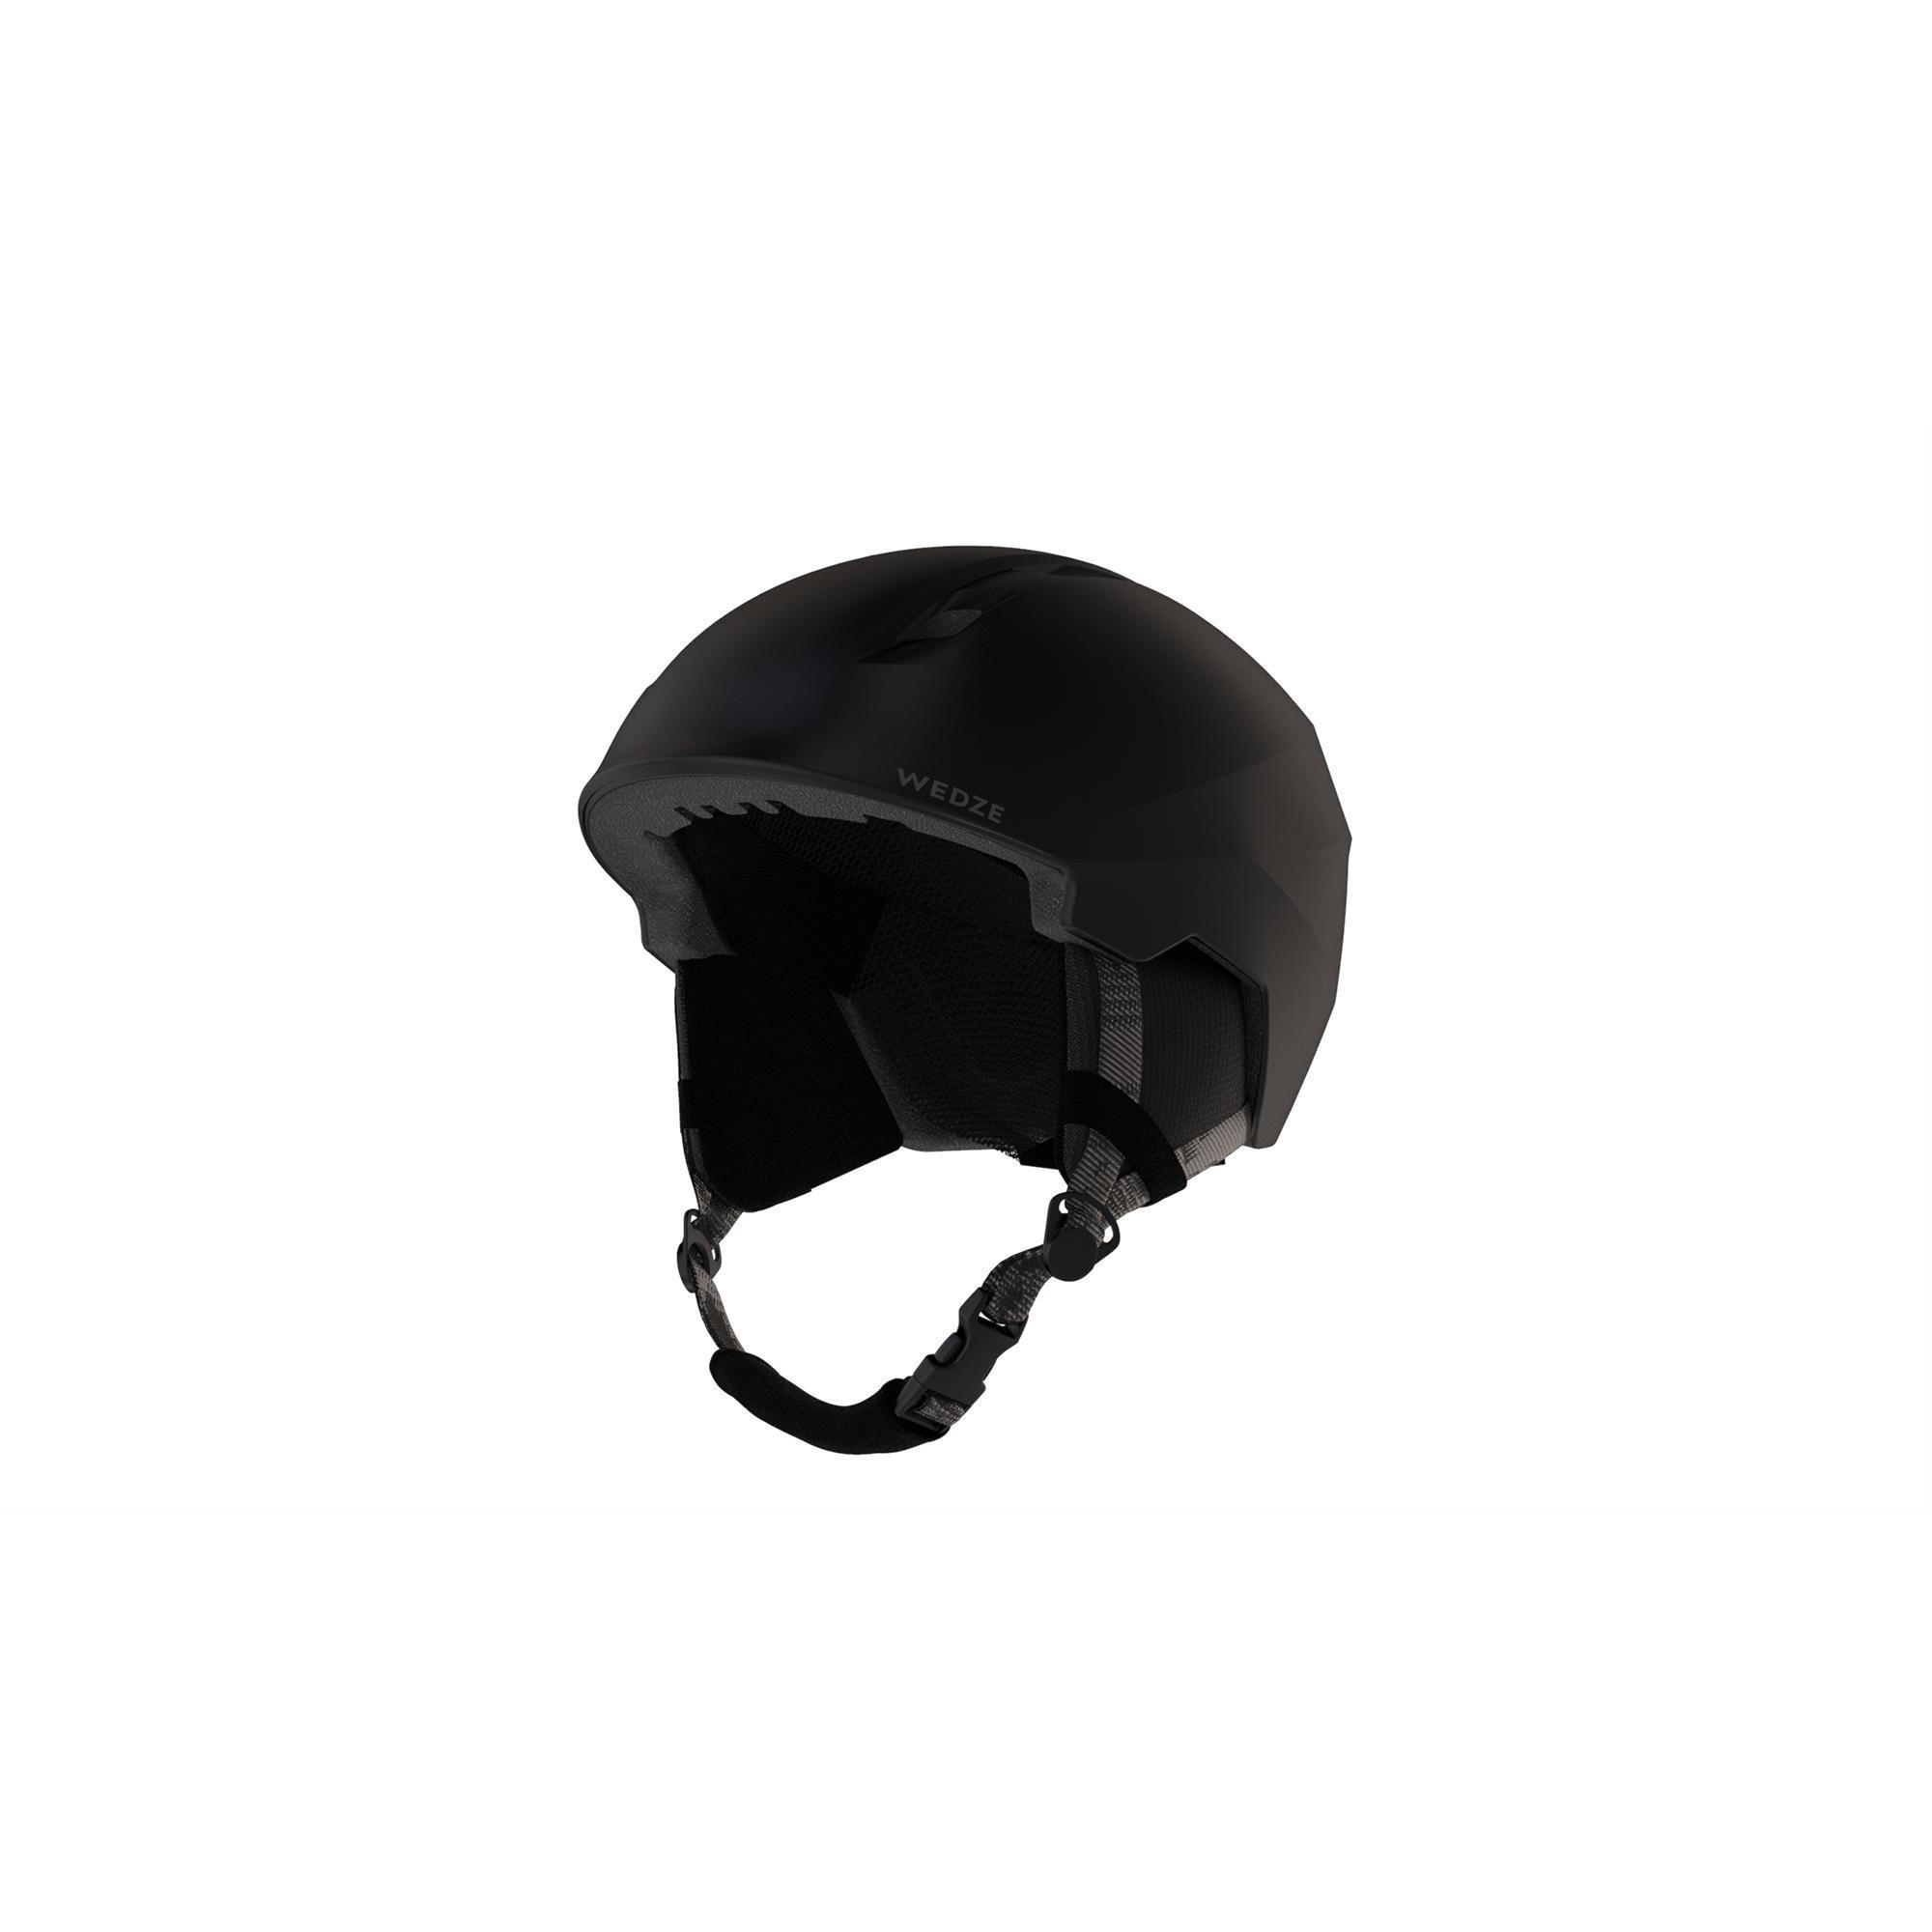 Image of Wed'ze Skihelm PST 500 zwart